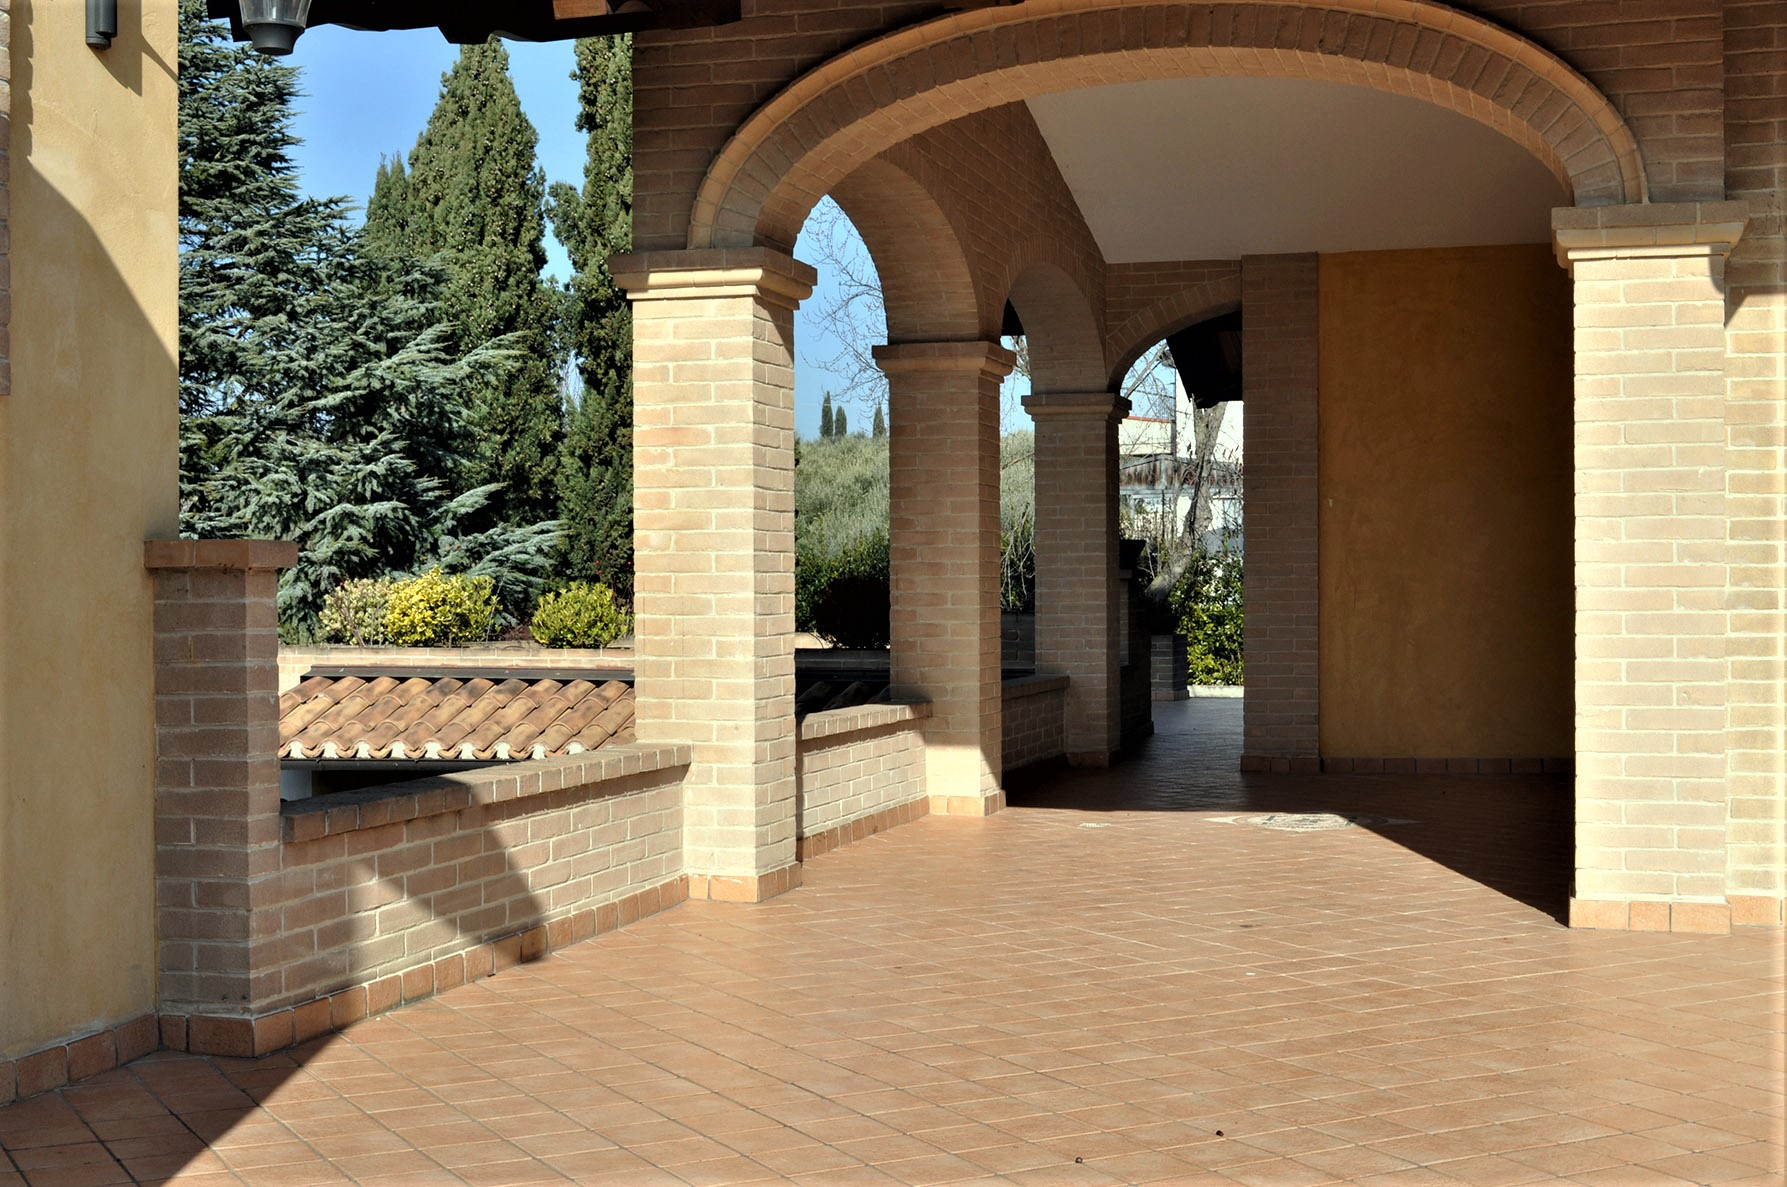 Villa Villa for sale Tortoreto (TE), Villa Bianca - Tortoreto - EUR 770.233 410